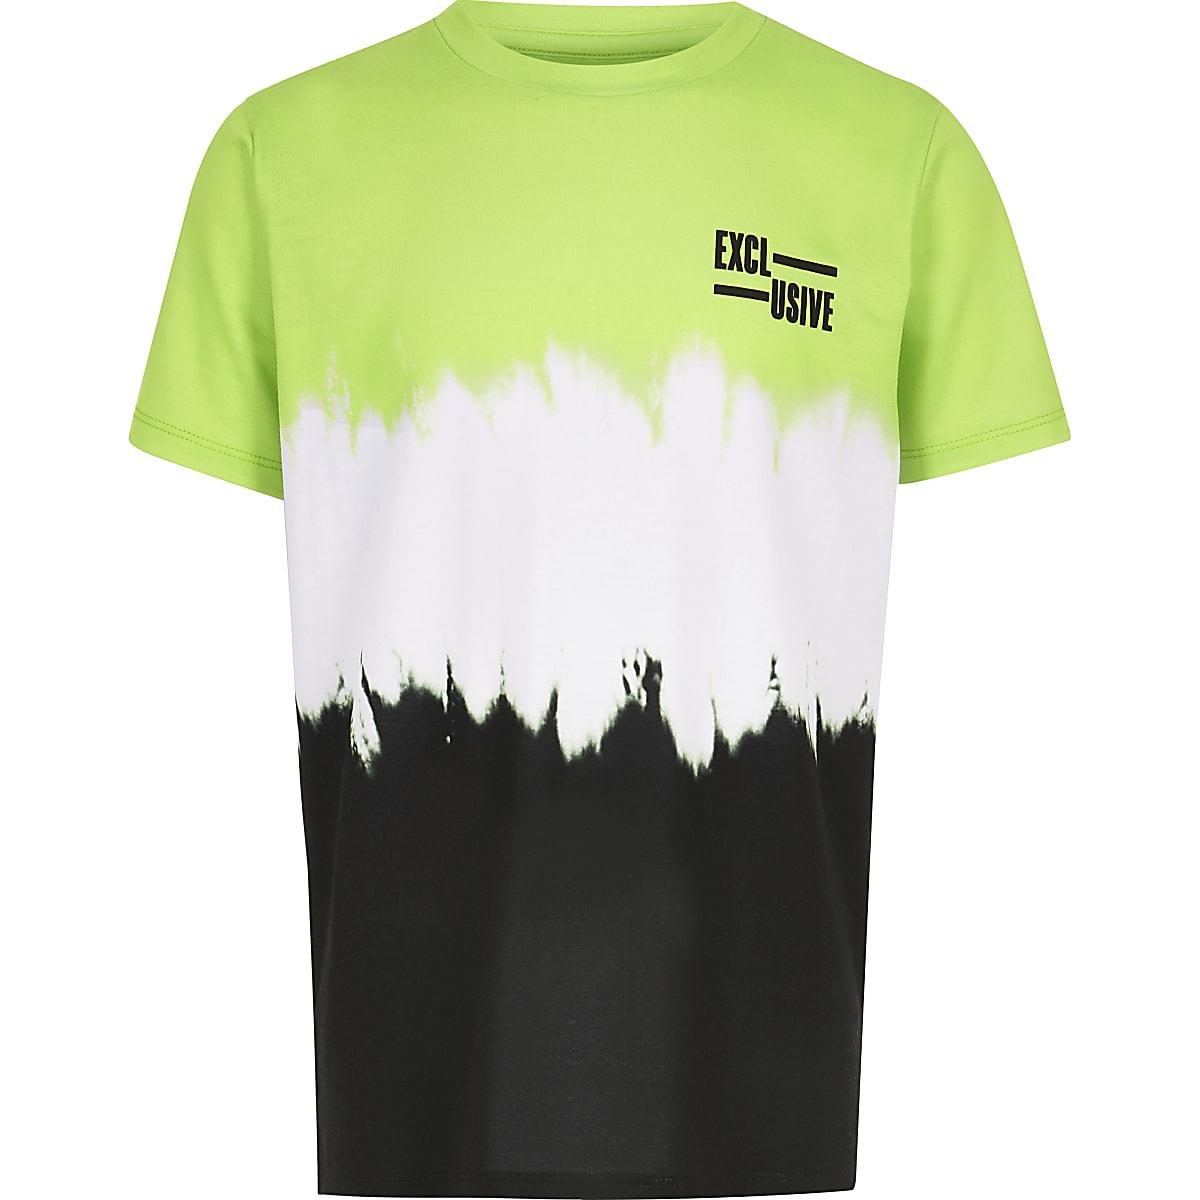 Boys green faded T-shirt